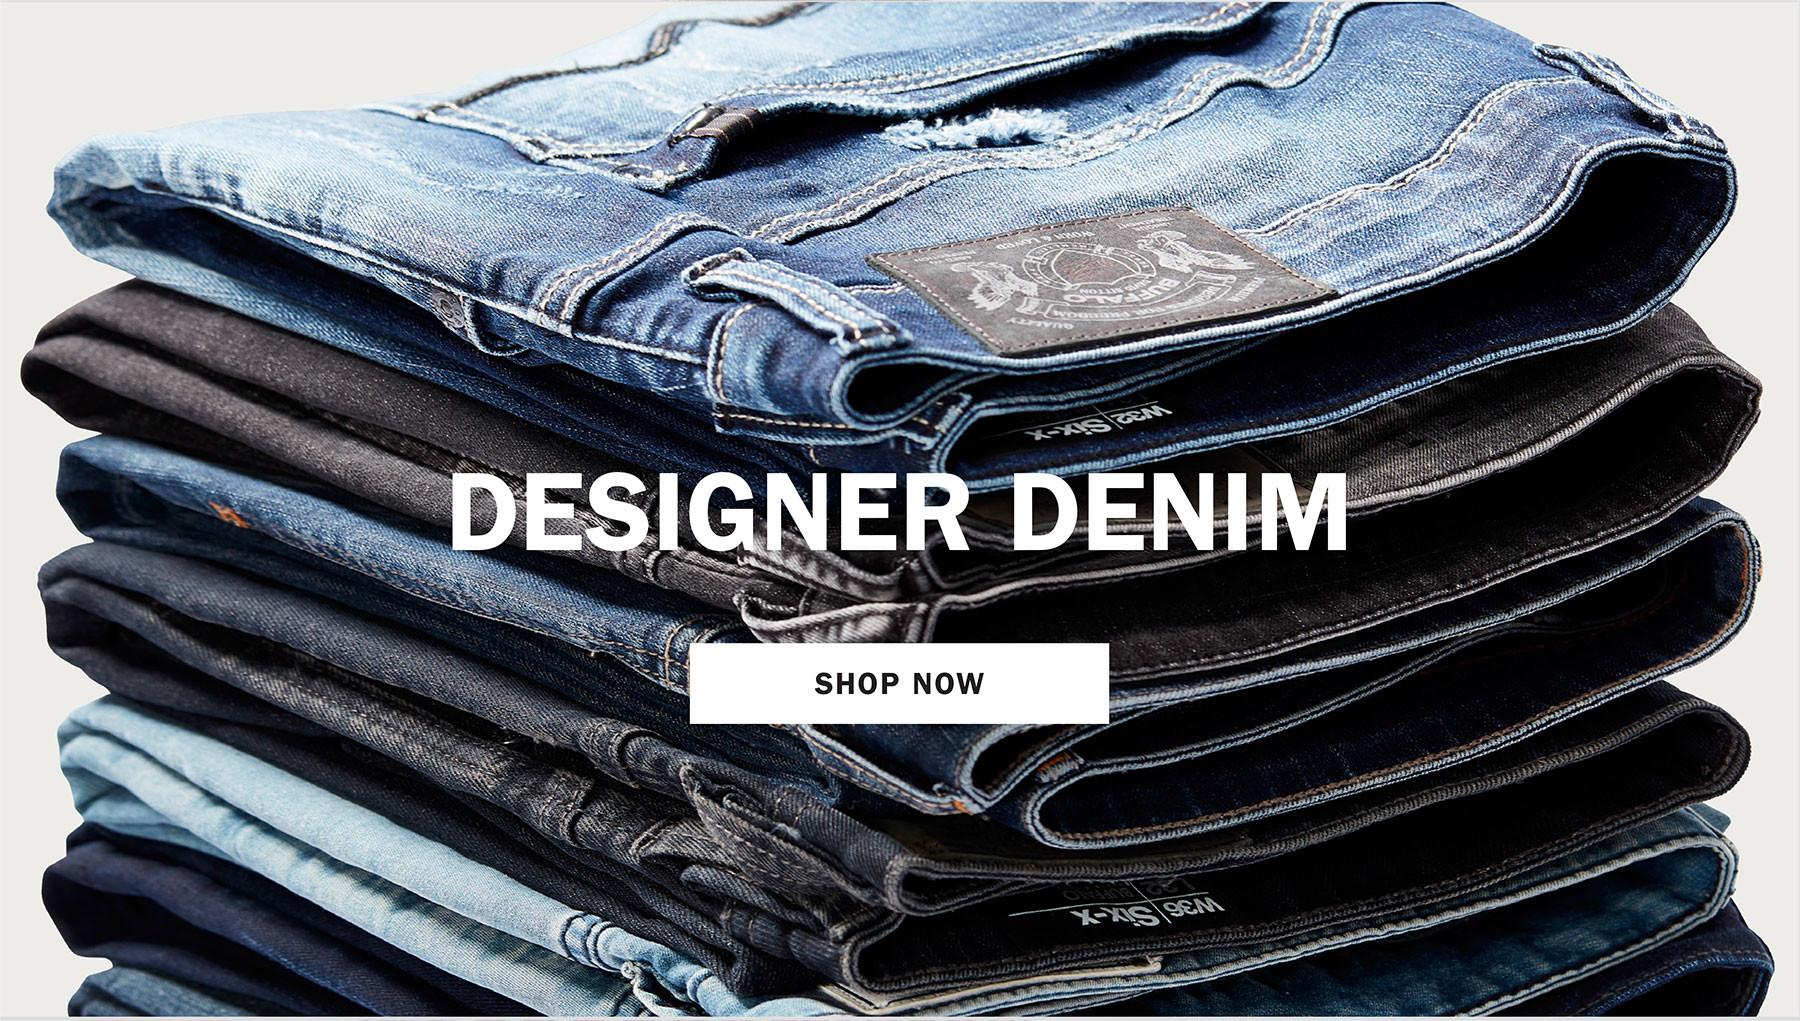 DESIGNER DENIM | SHOP NOW